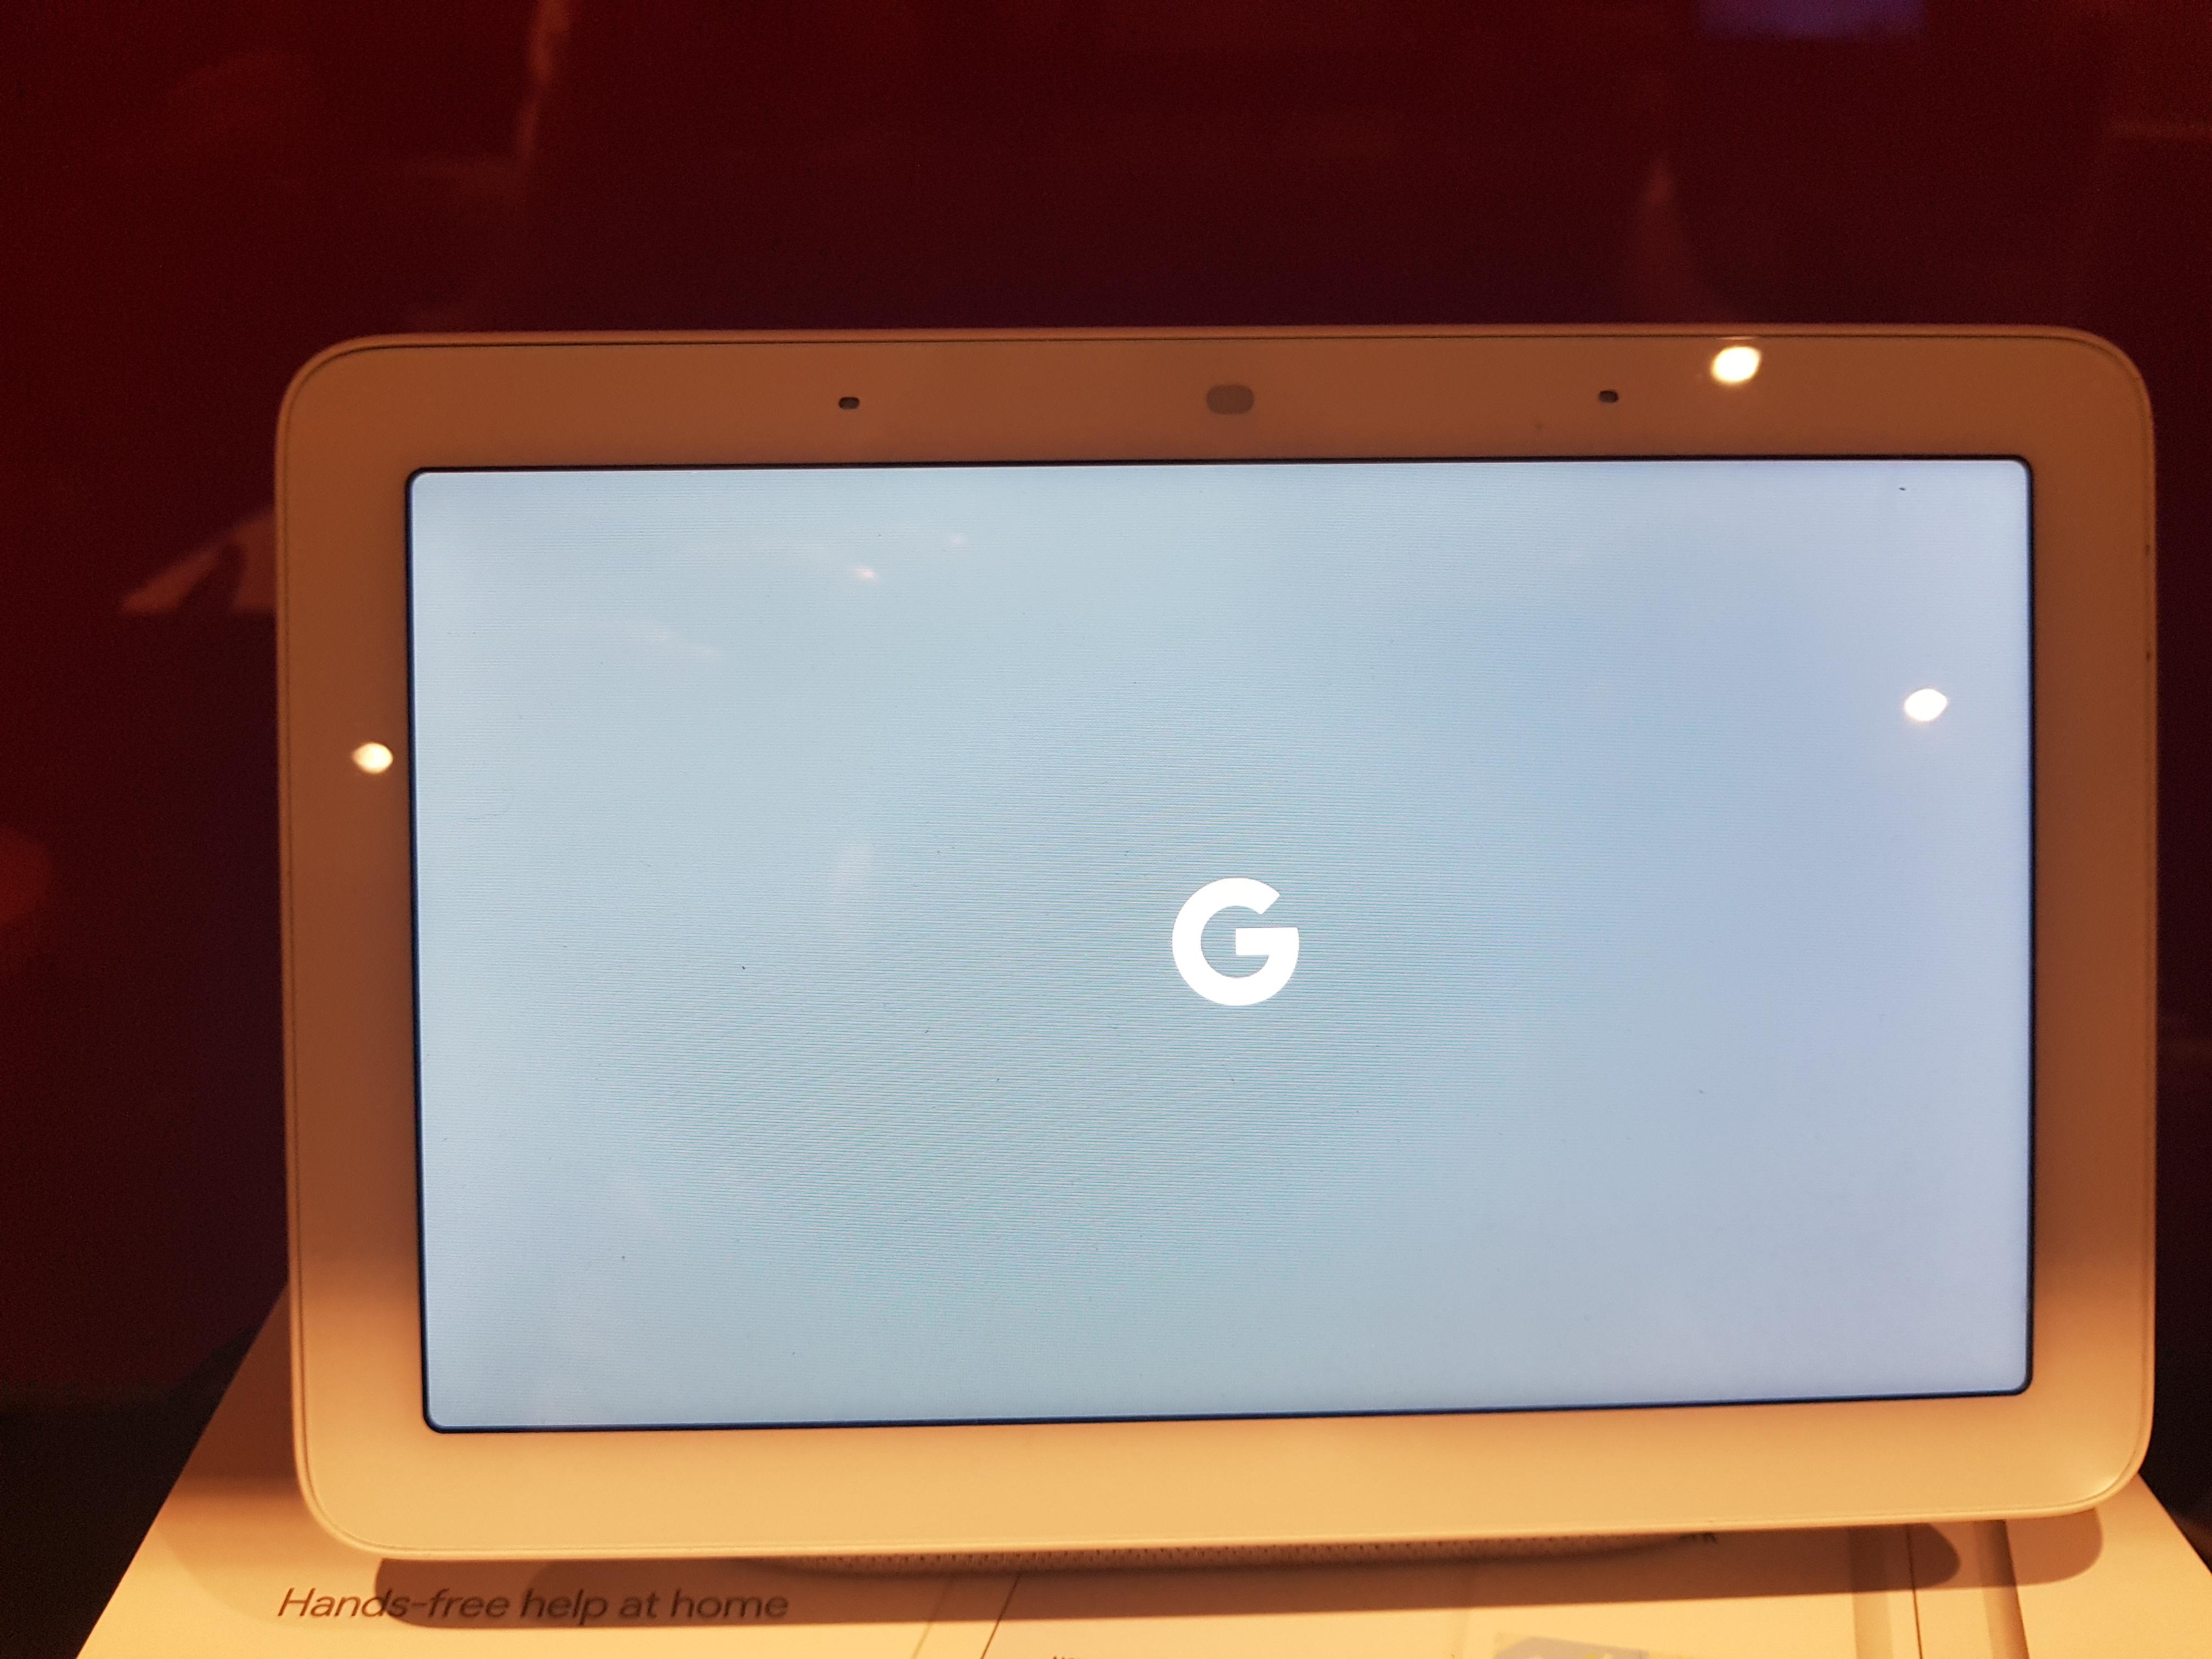 Stuck Bootloop on google home hub display, reset holding